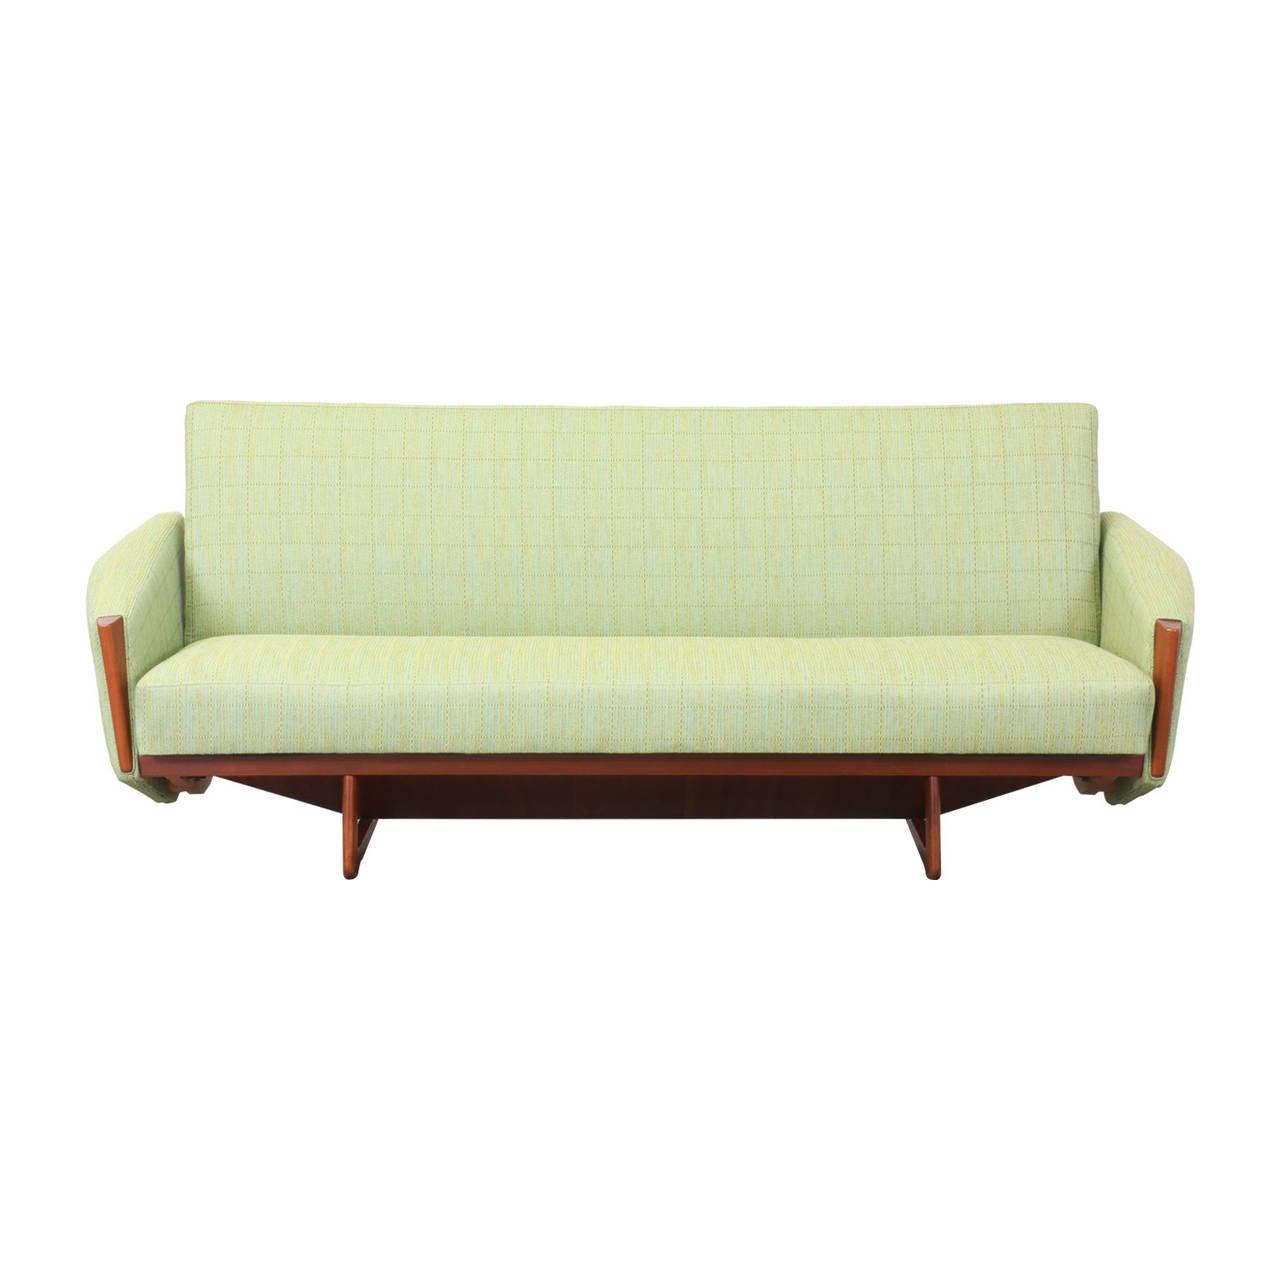 Danish Modern Sofas: Danish Modern Teak Sofa Bed At 1stdibs